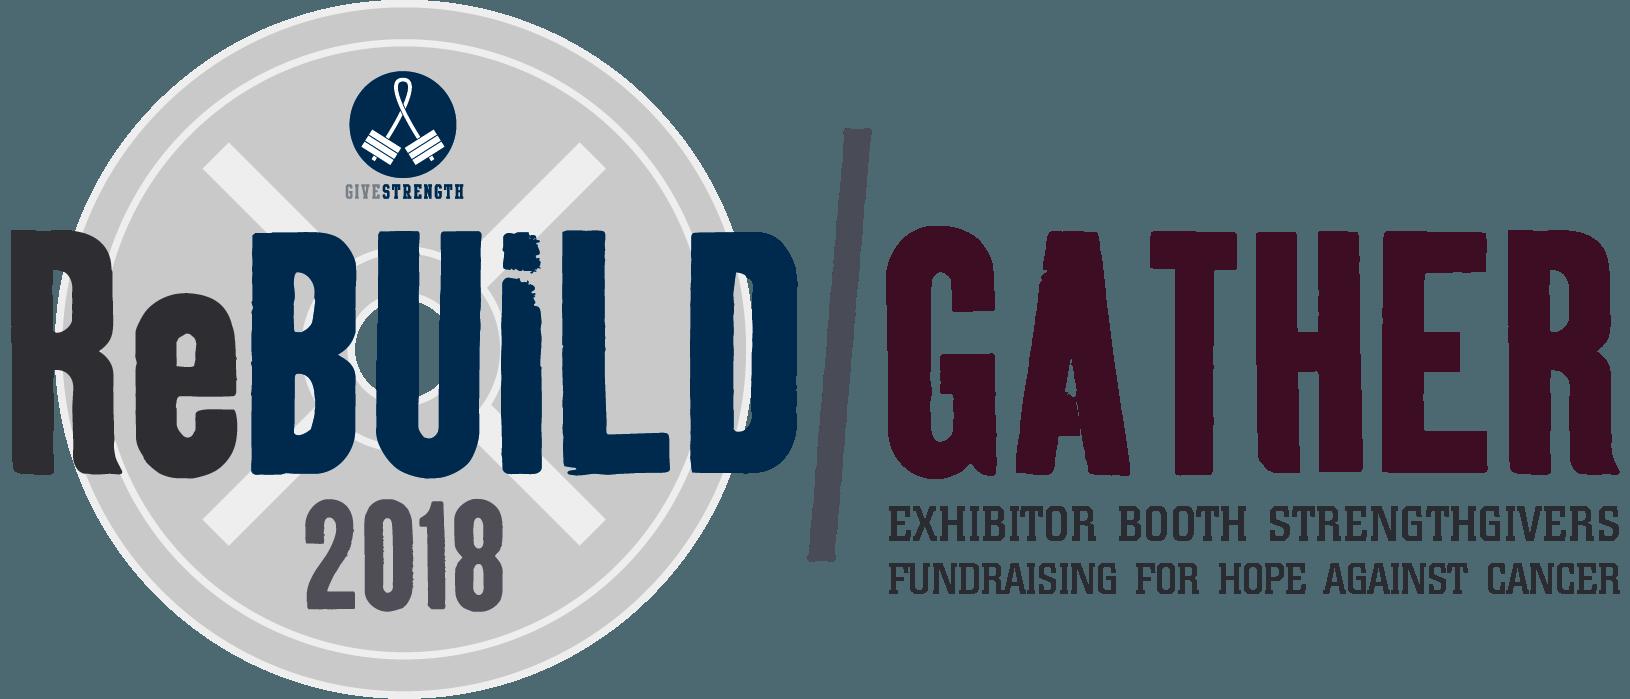 ReBUILD GATHER Srengthgivers Logo.png